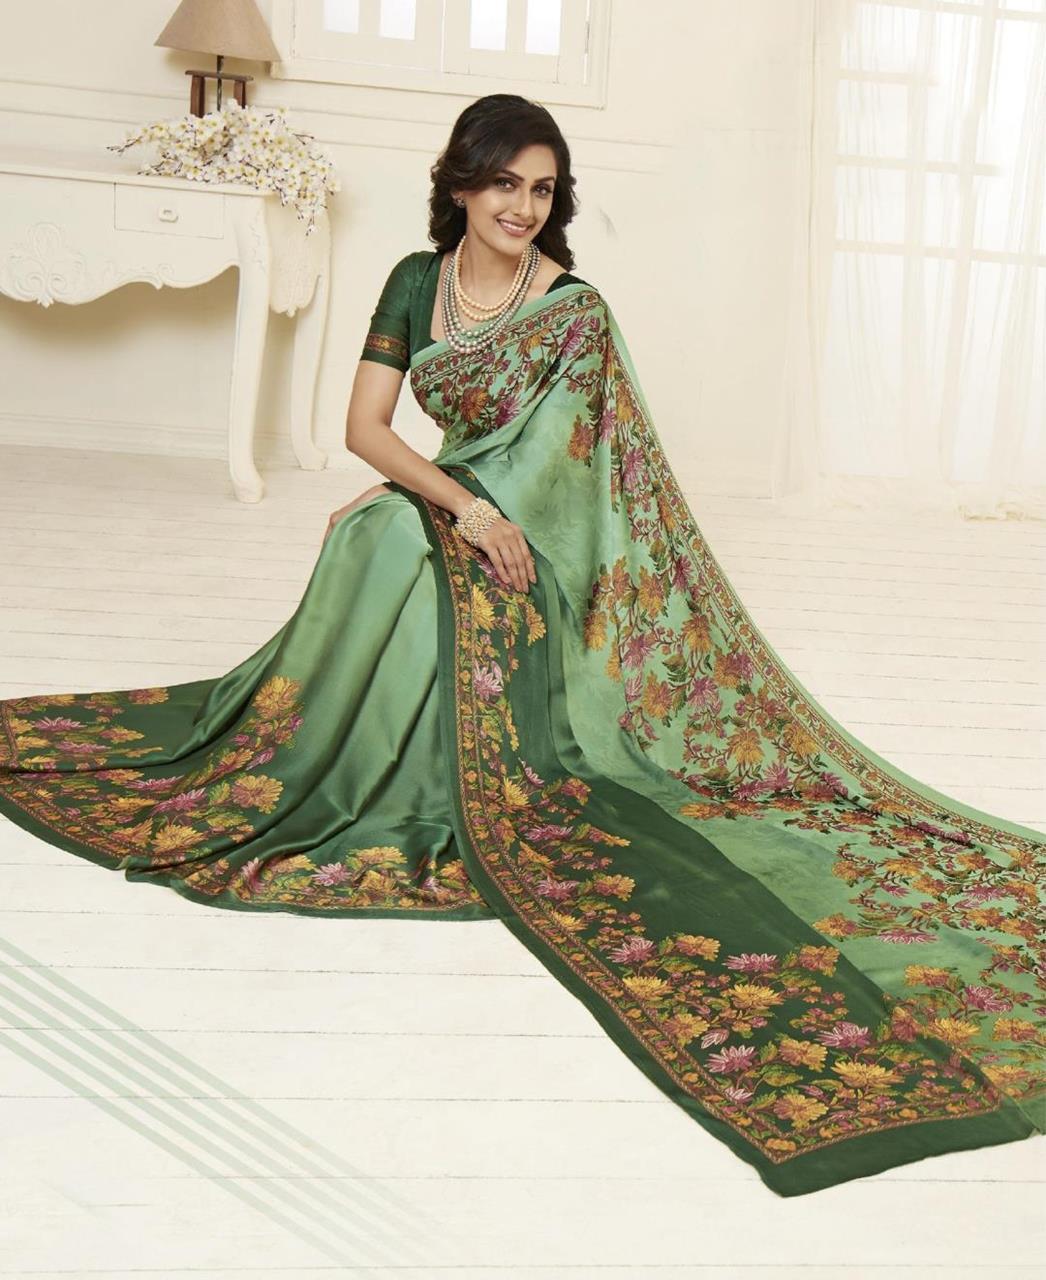 Printed Satin Saree in Green